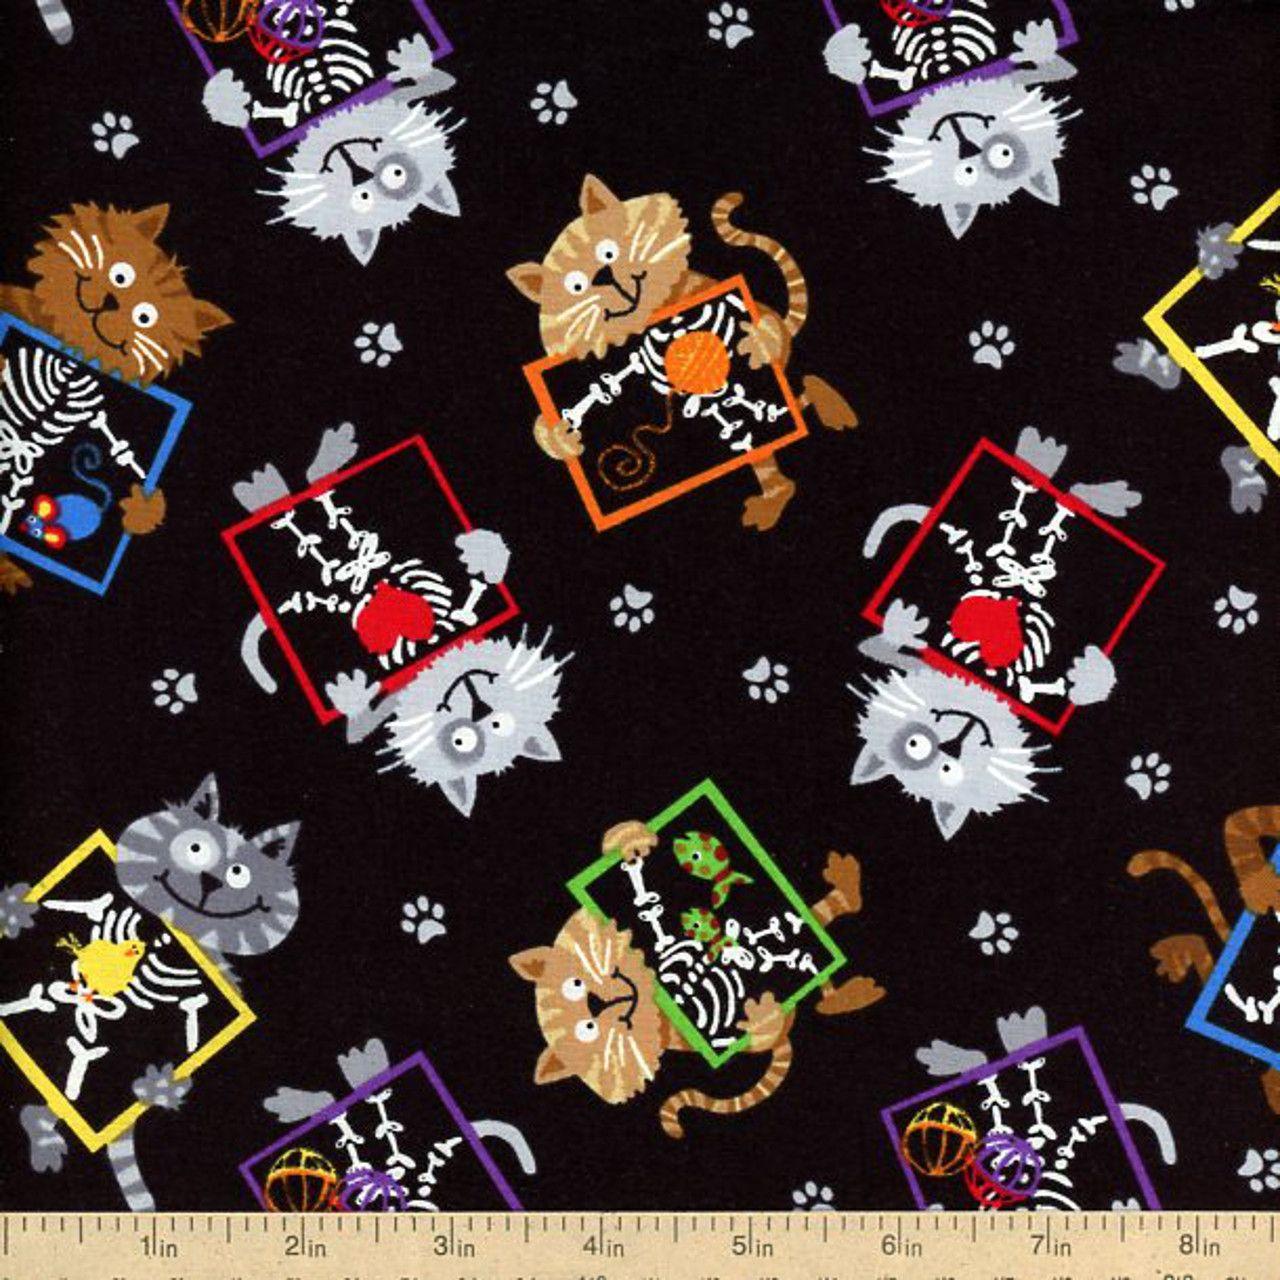 X Ray Skeleton Kitty Cat Bones Pediatric Hospital Scrubs Fabric Whimsical Cats  www.allegrofabrics.com